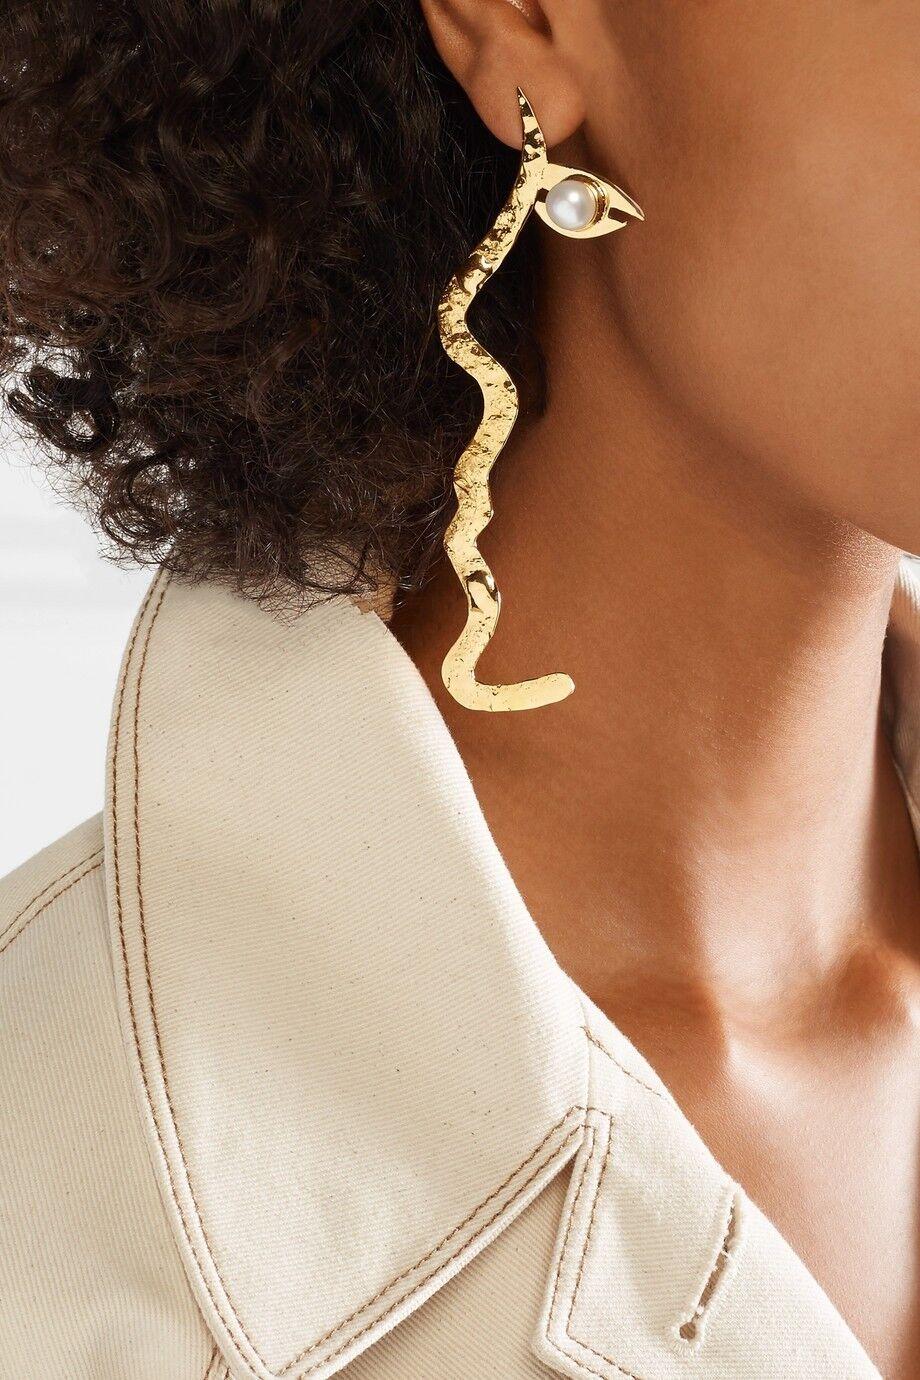 REJINA PYO + Anissa Kermiche Grande Tete a Tete gold-plated pearl earrings